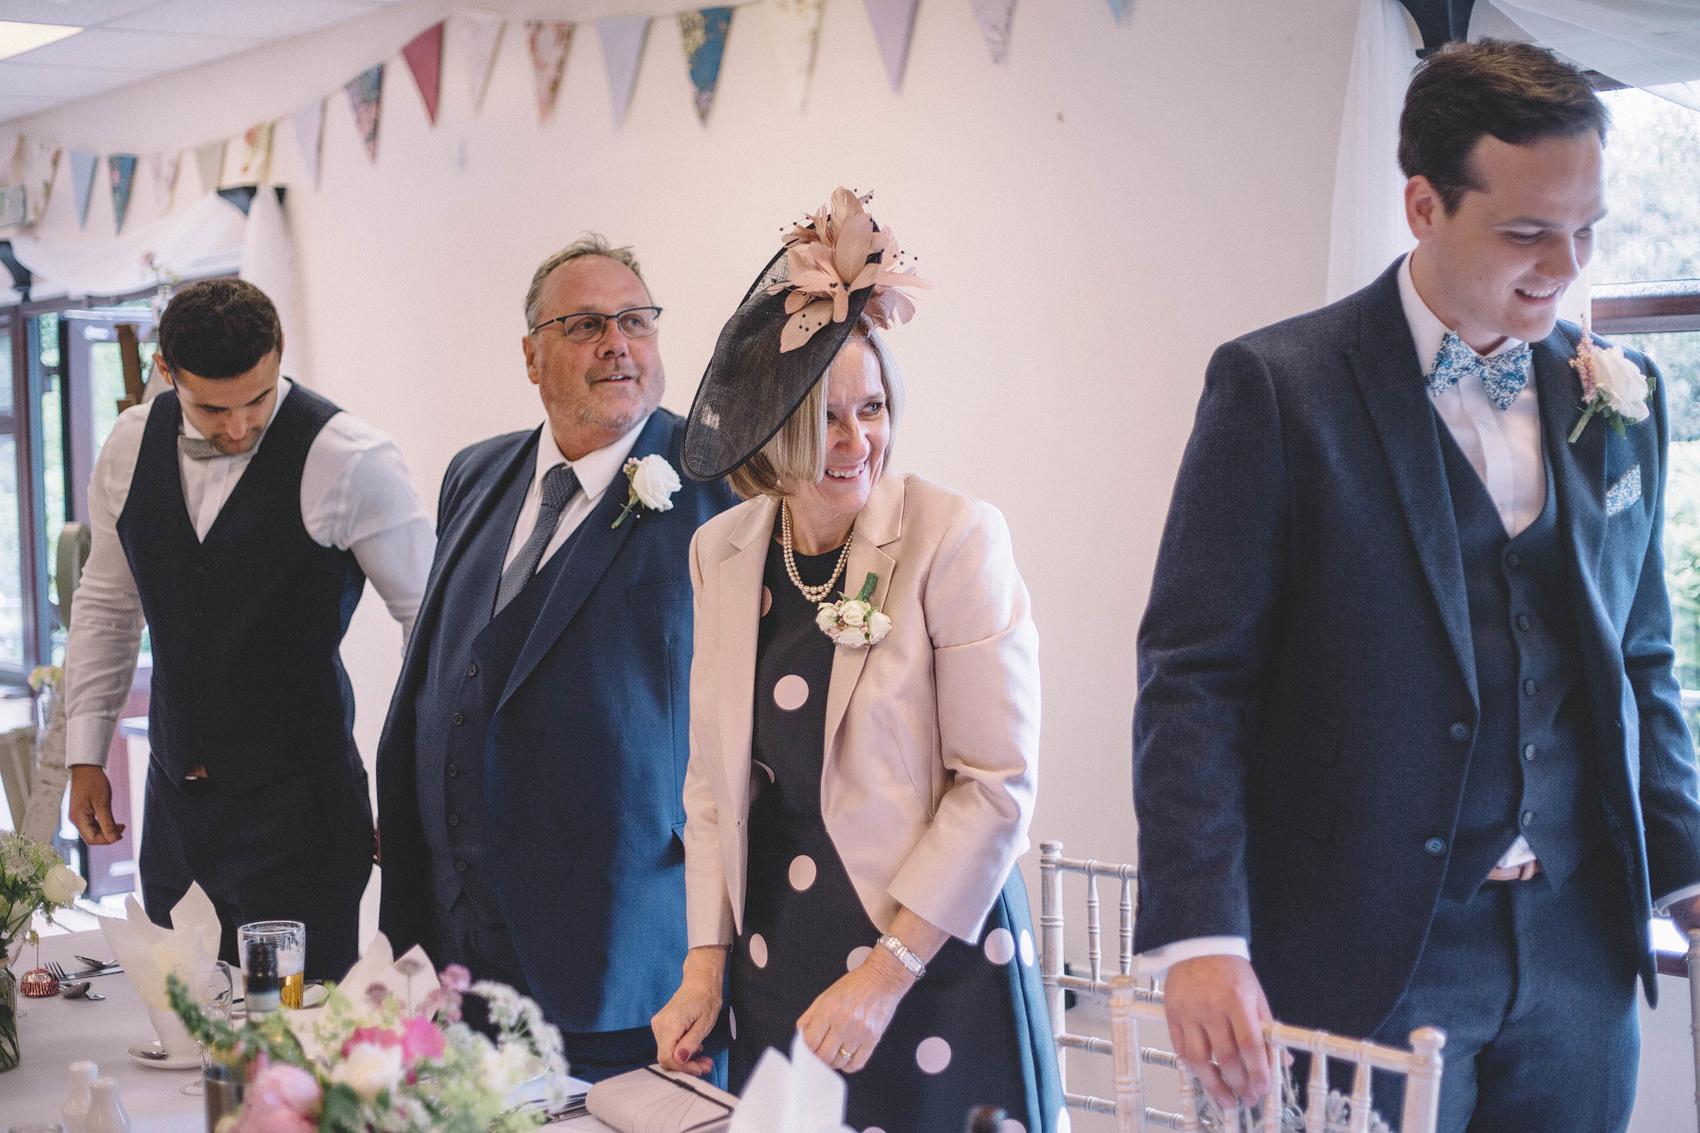 Dilhorne_Village_Hall_Wedding_Photography_-_54_.jpg